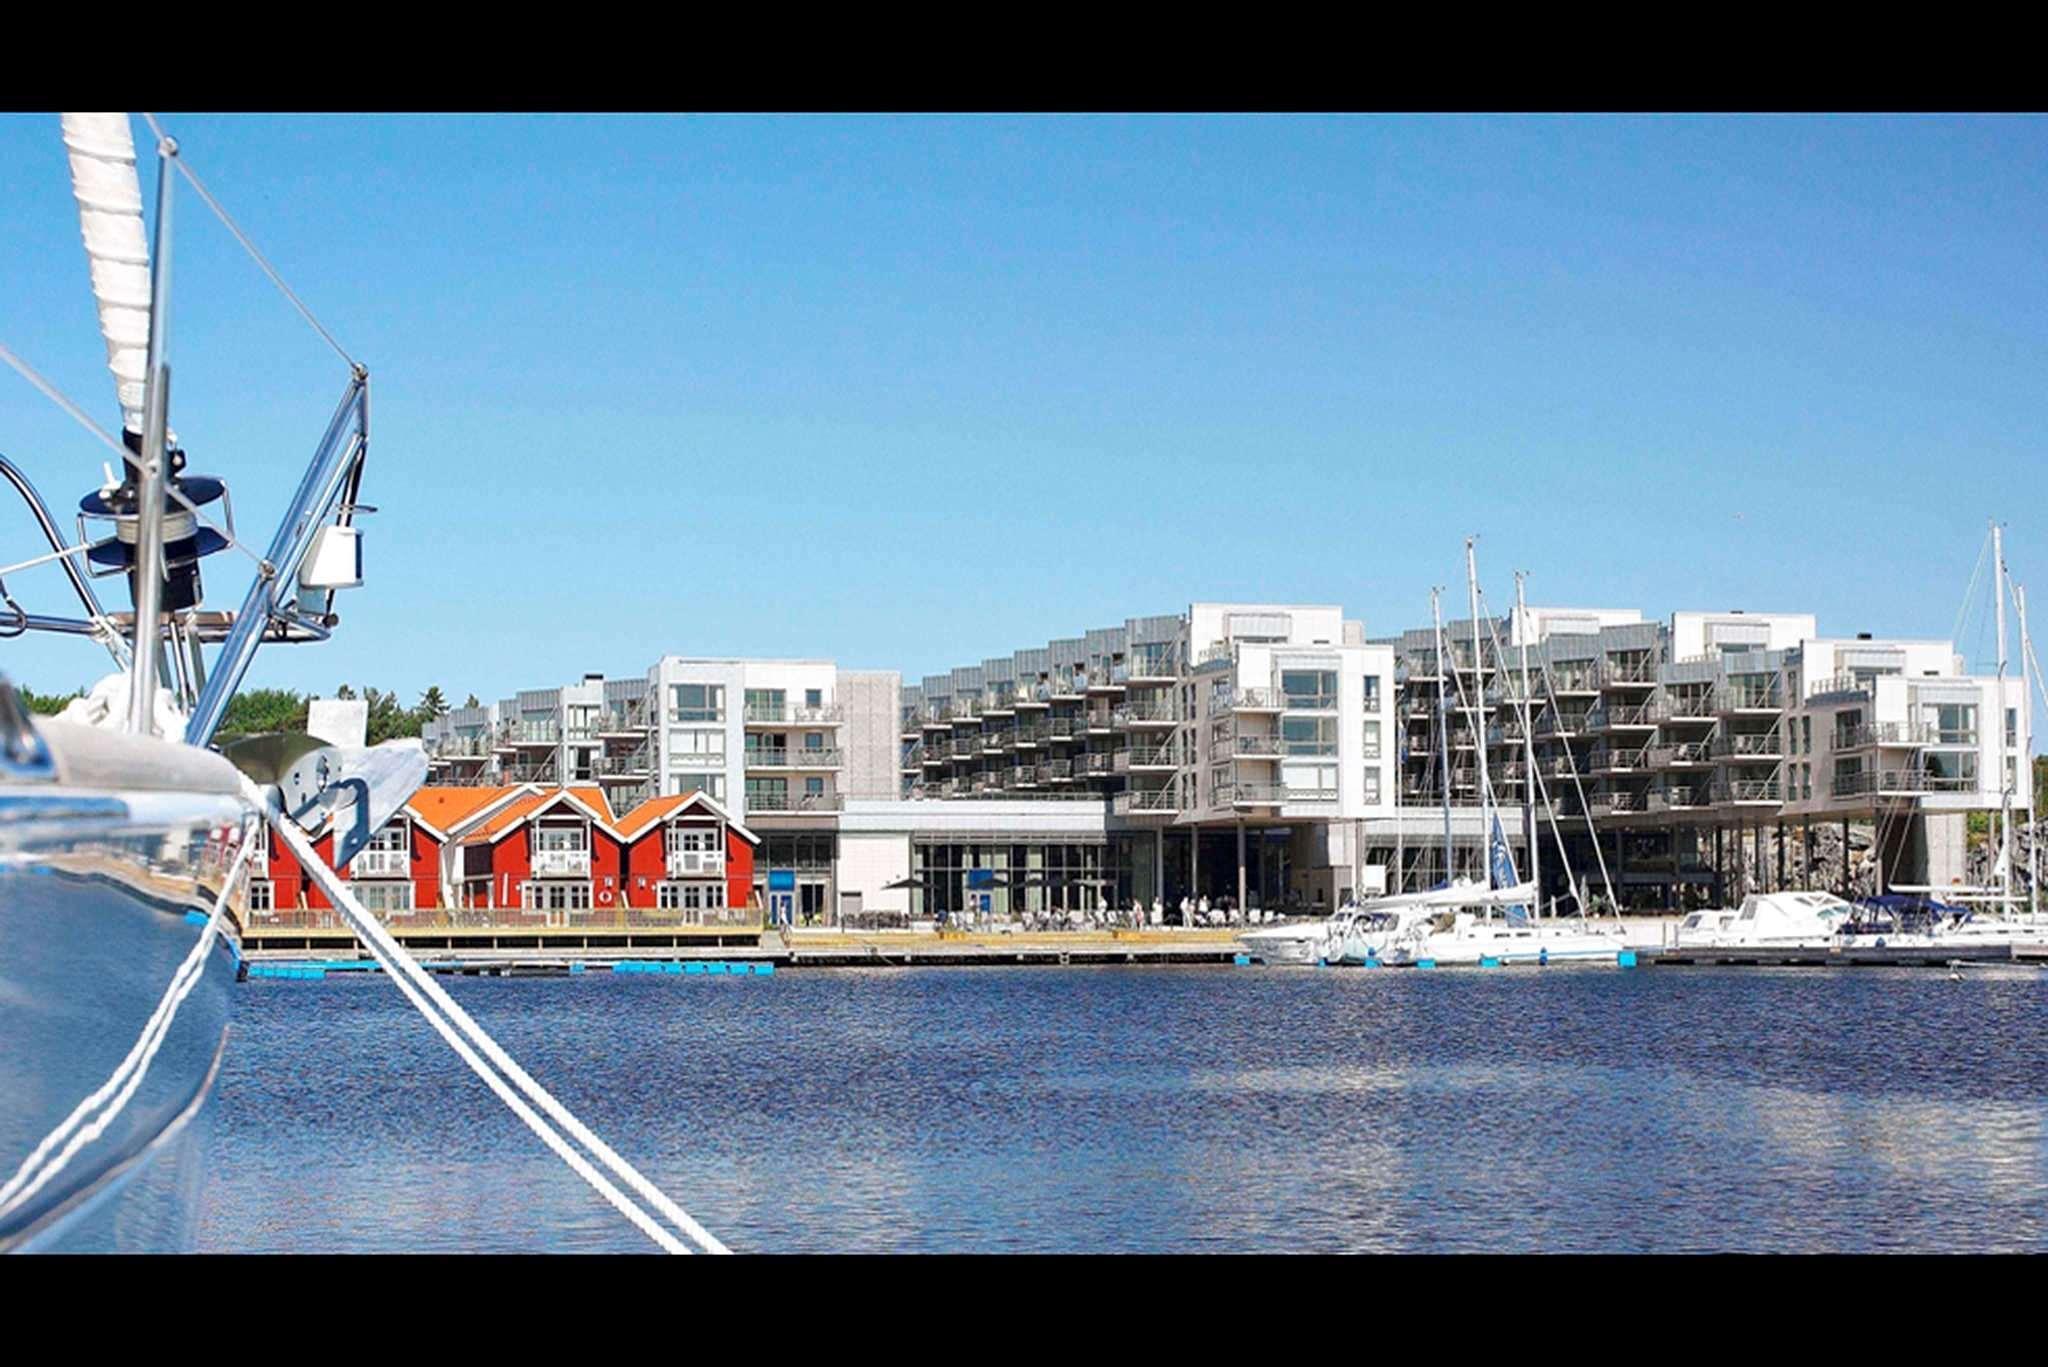 Stromstad Spa And Resort